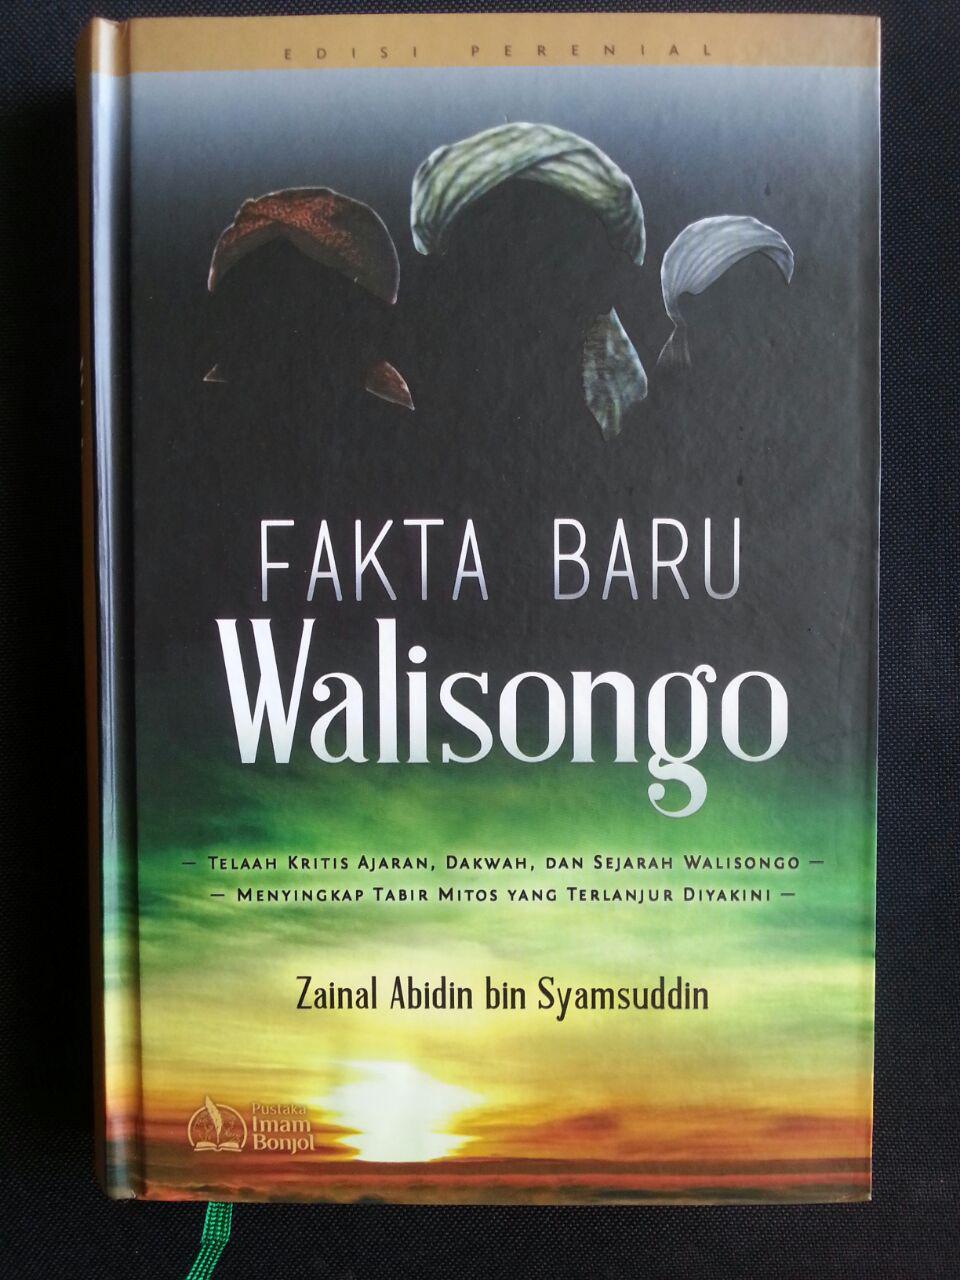 Buku Fakta Baru Walisongo cover 2